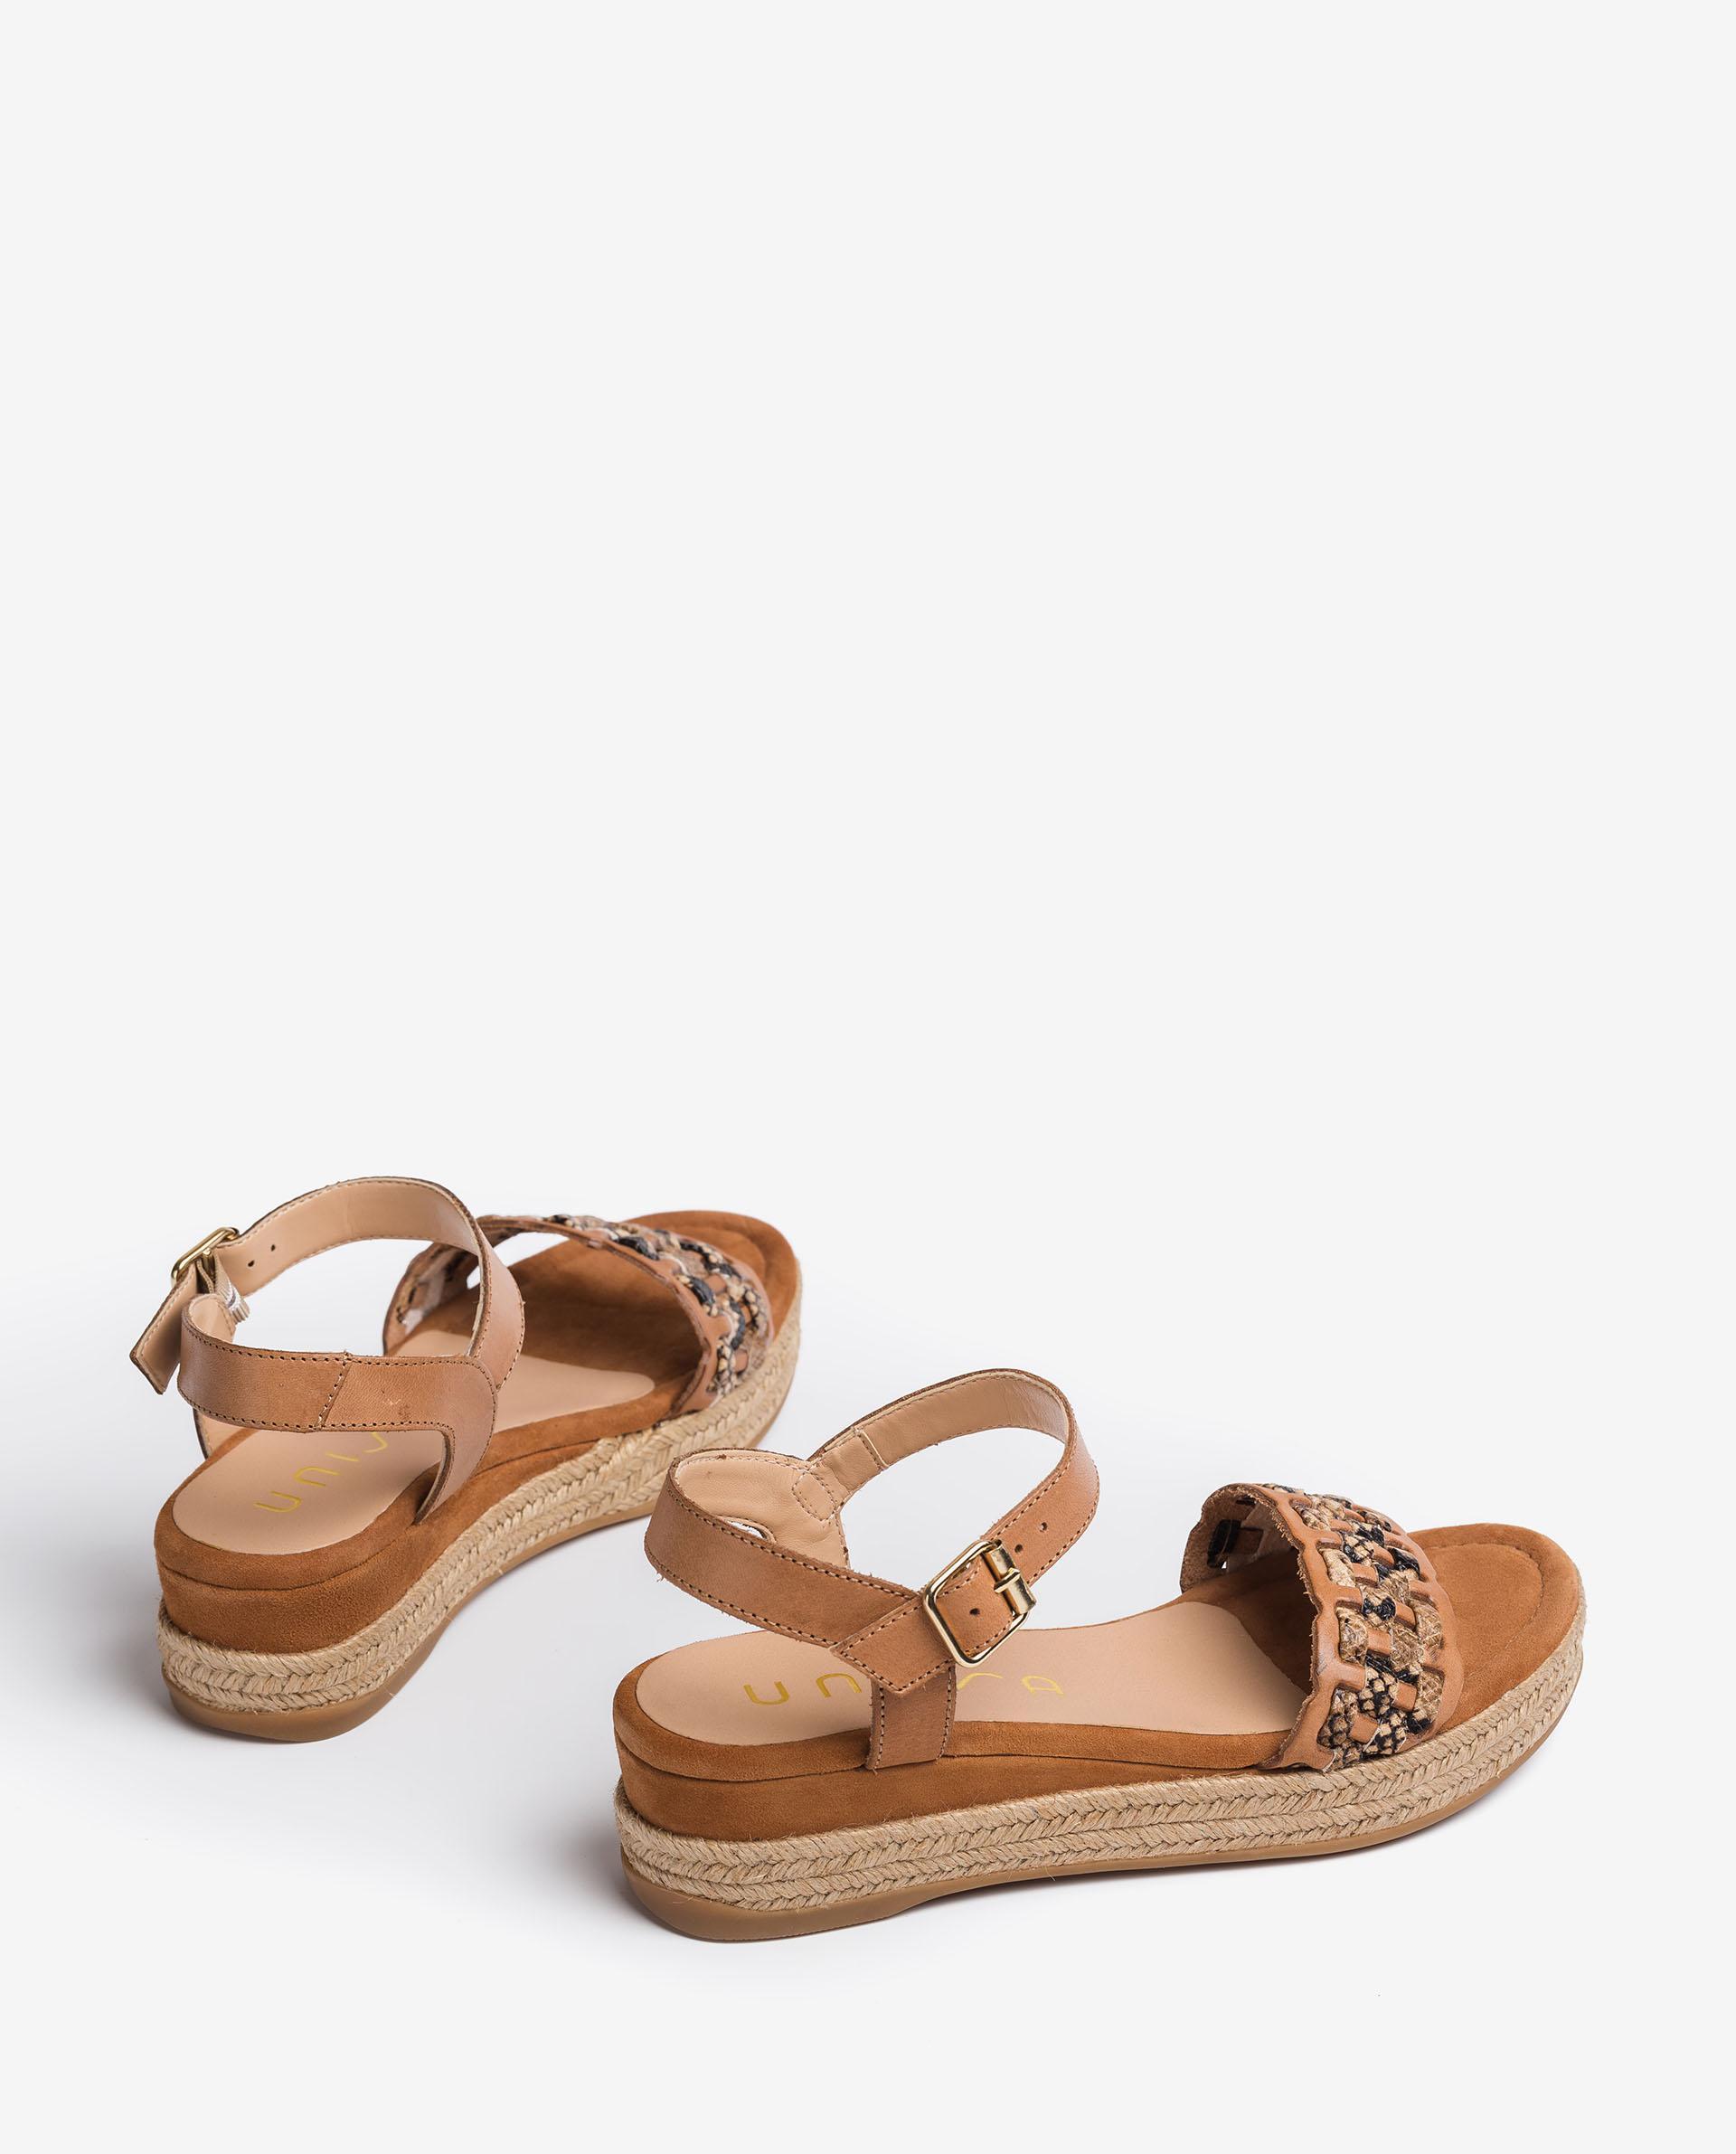 UNISA Braided contrast sandals GATIKA_RAN_VIP 2